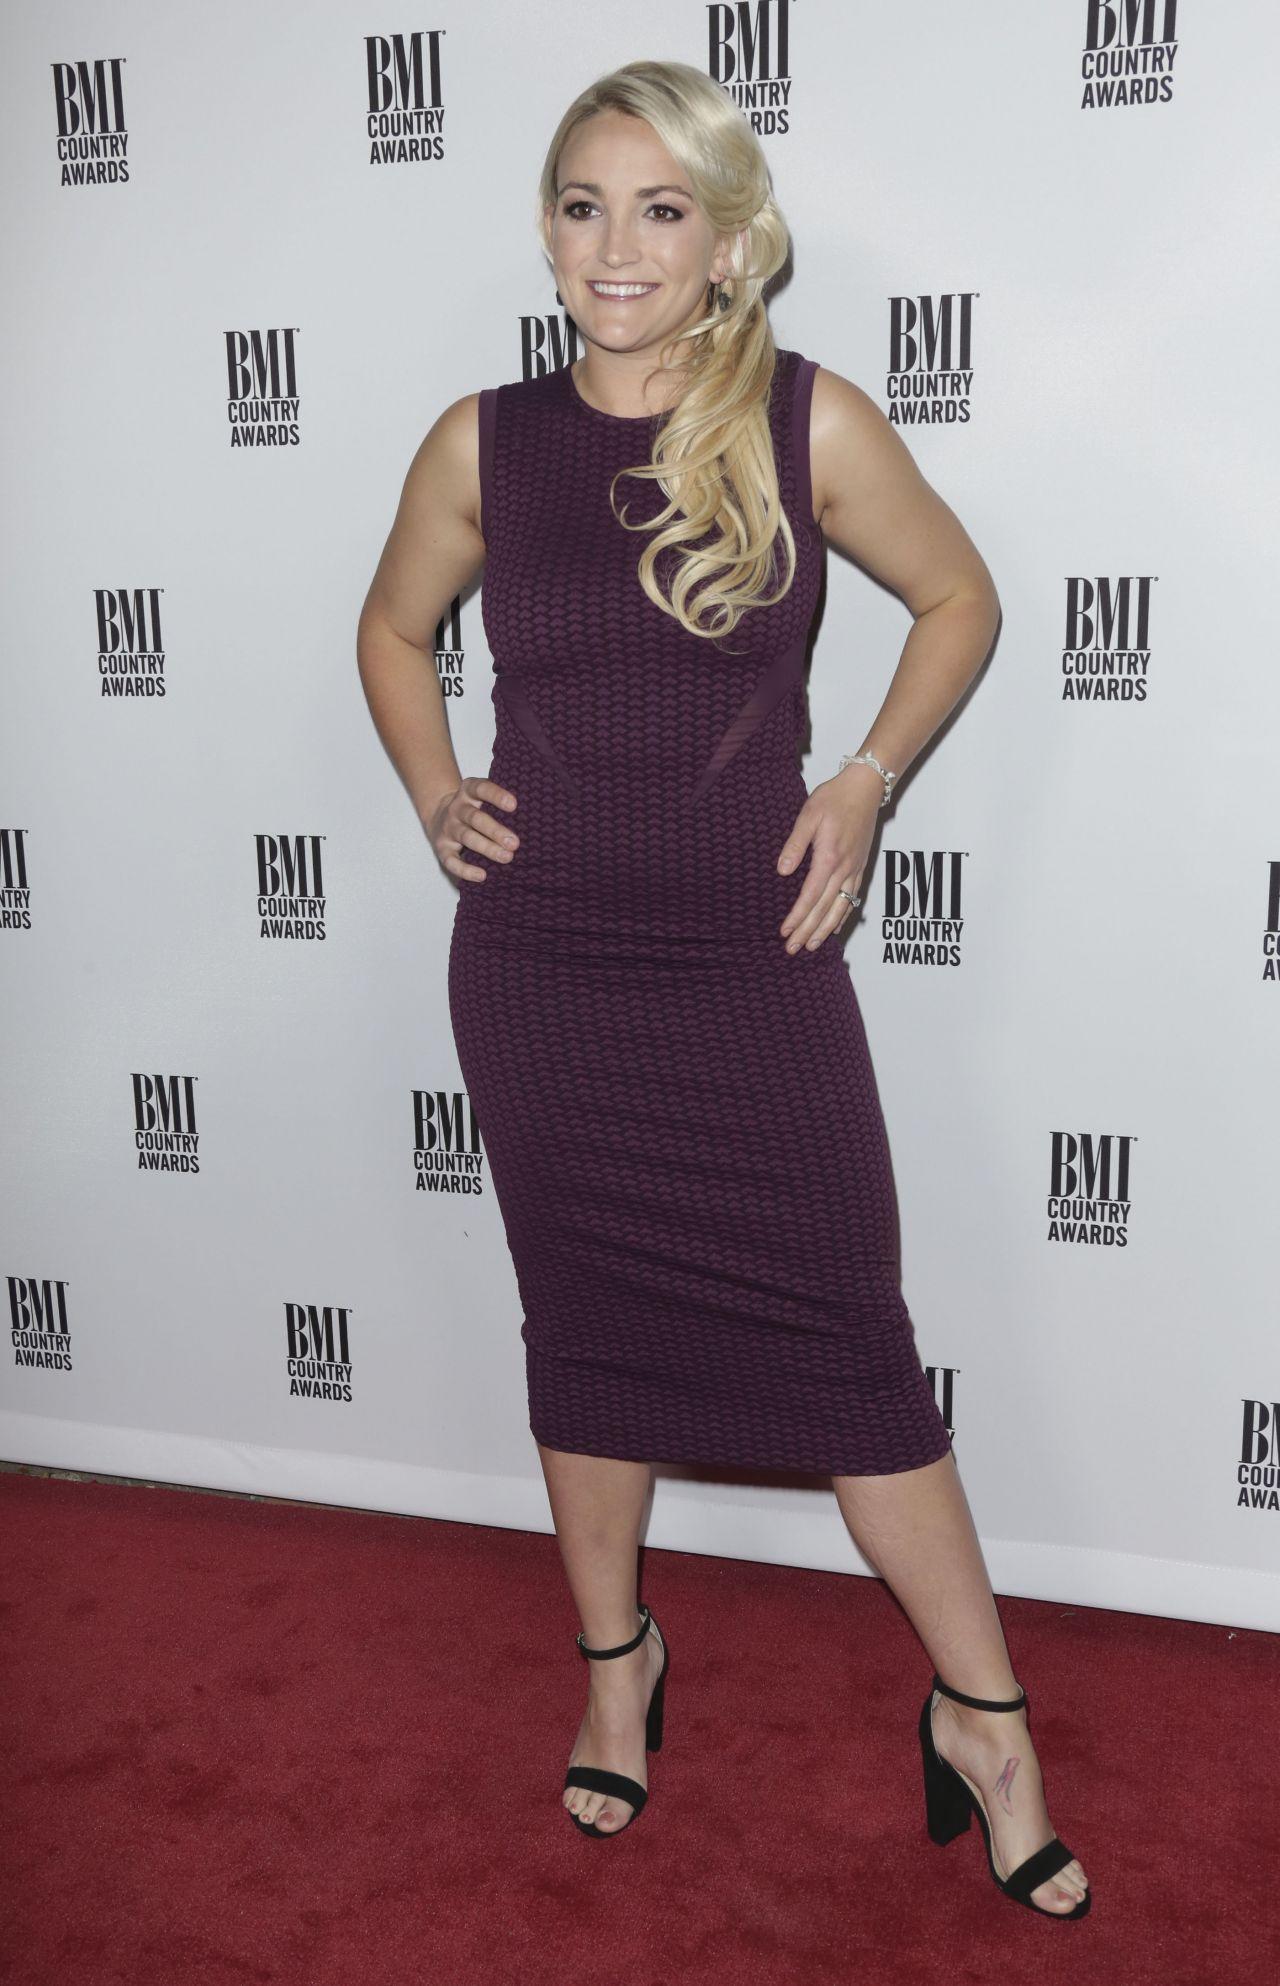 Jamie Lynn Spears 64th Annual Bmi Country Awards In